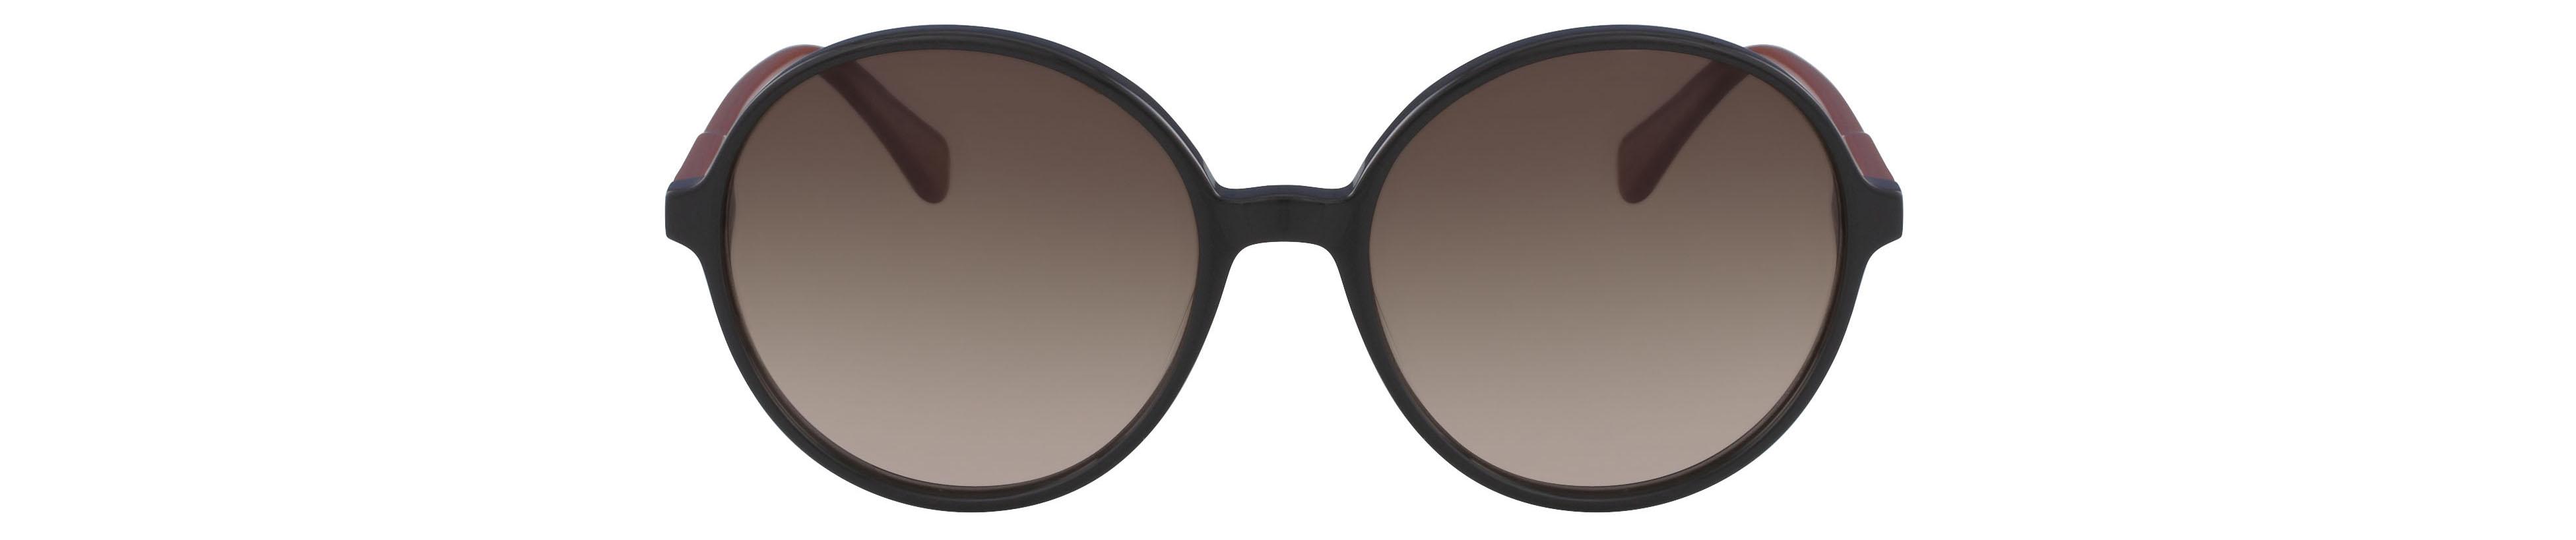 Longchamp Round Frame Classic Black Sunglasses